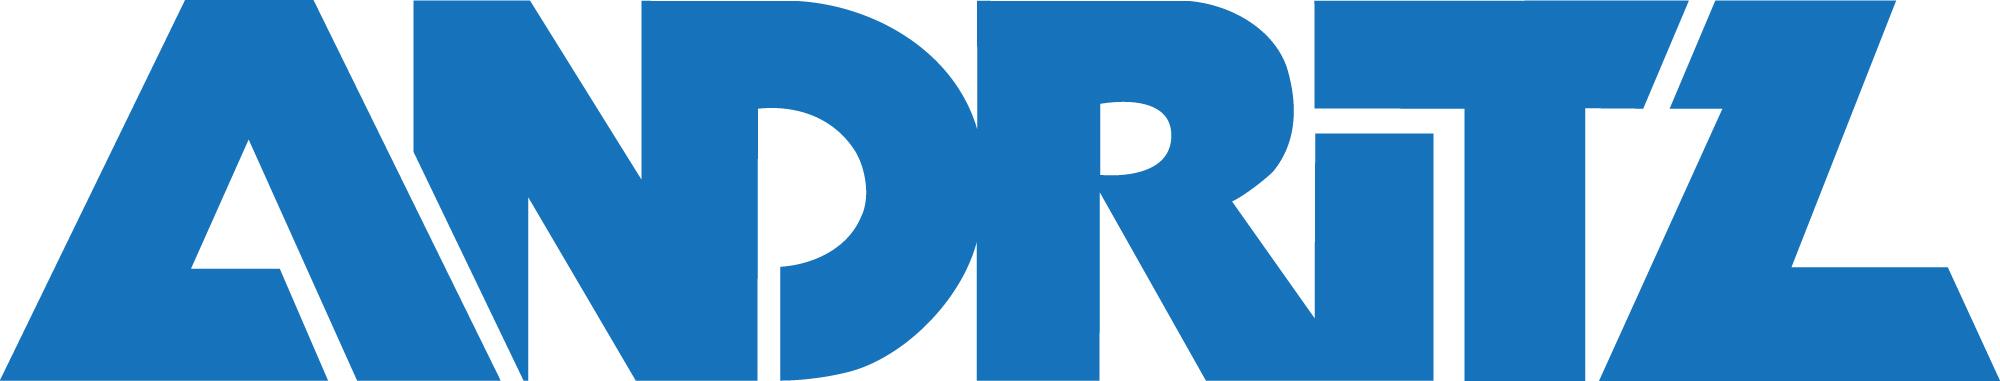 ANDRITZ_Logo_blue